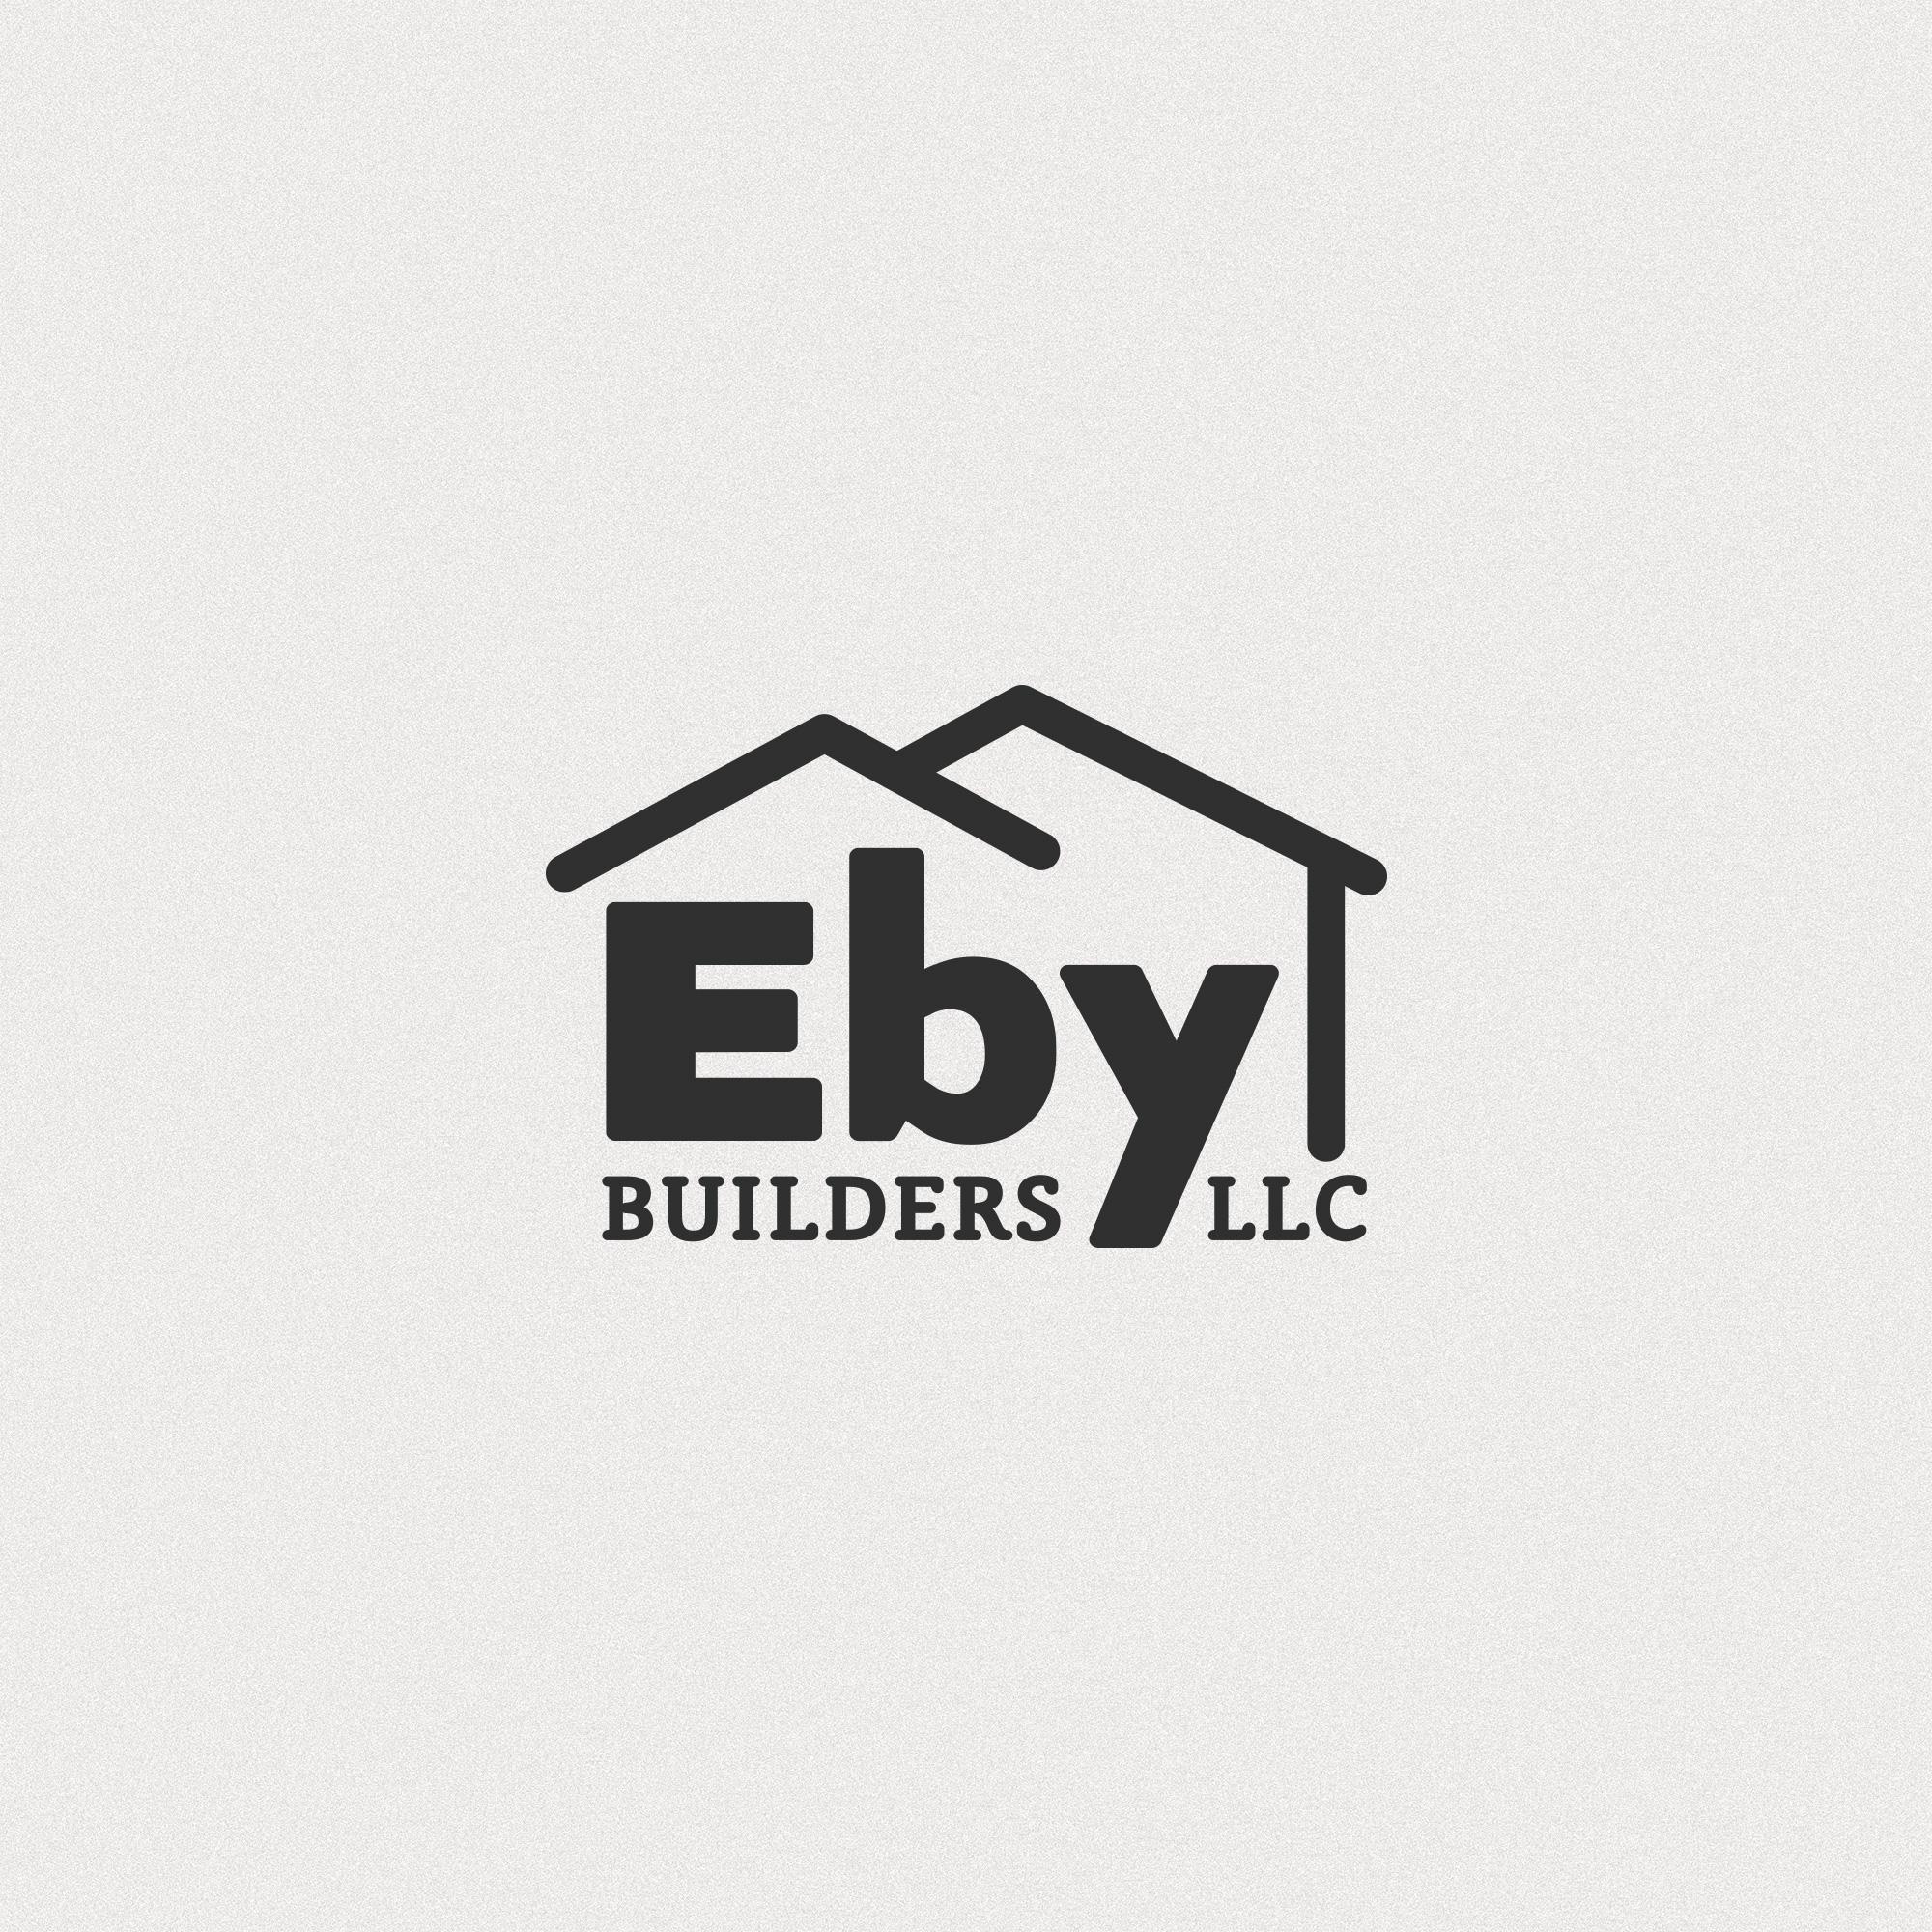 Eby Builders Logo Design